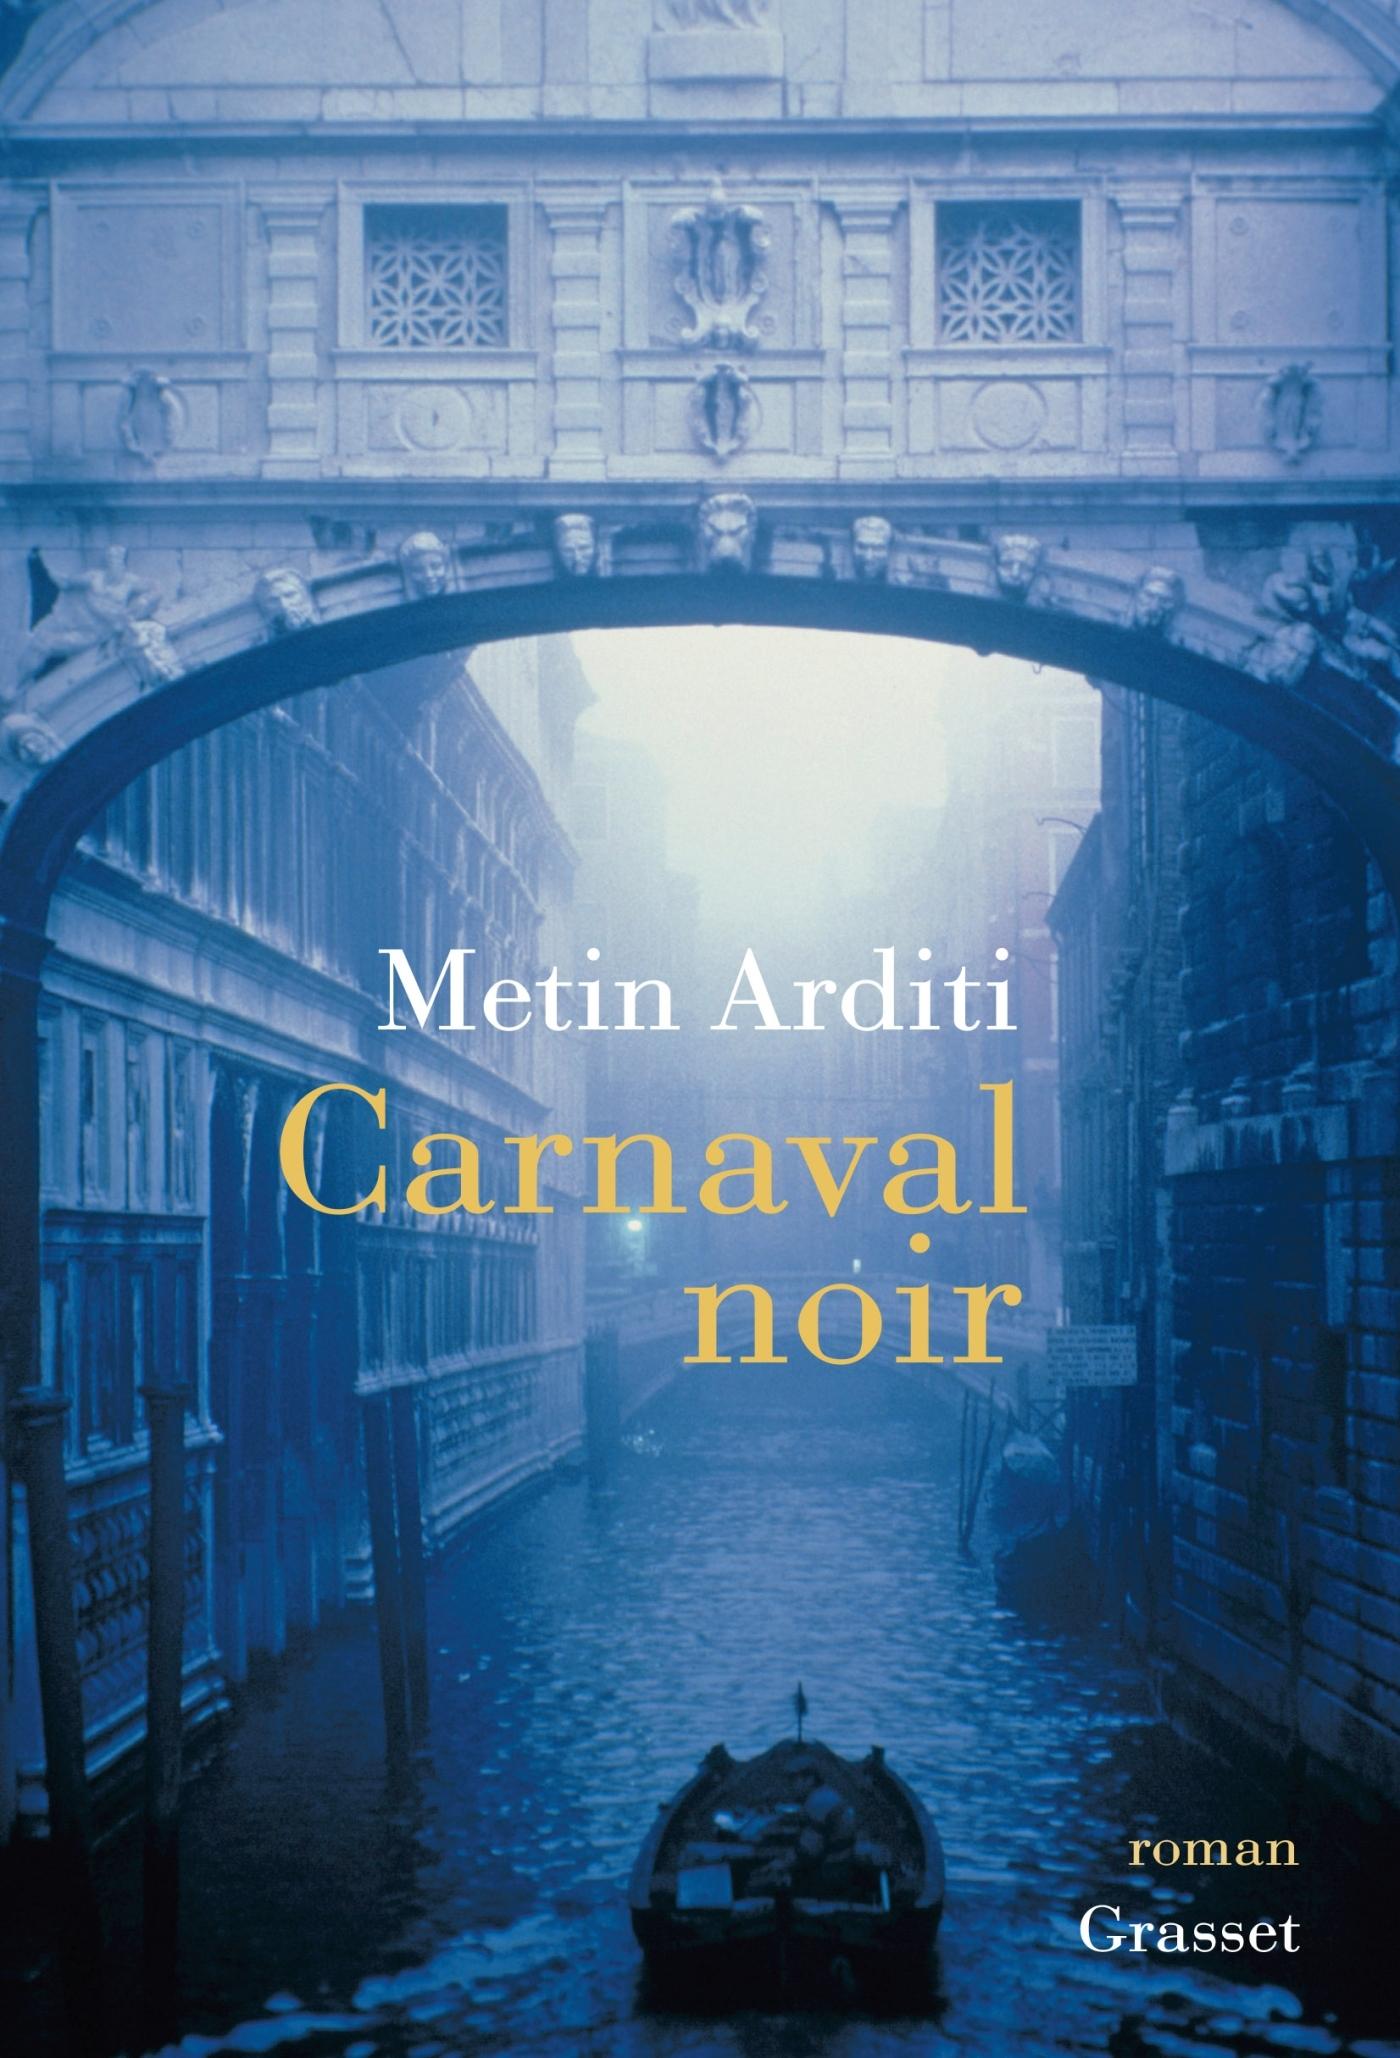 CARNAVAL NOIR - ROMAN